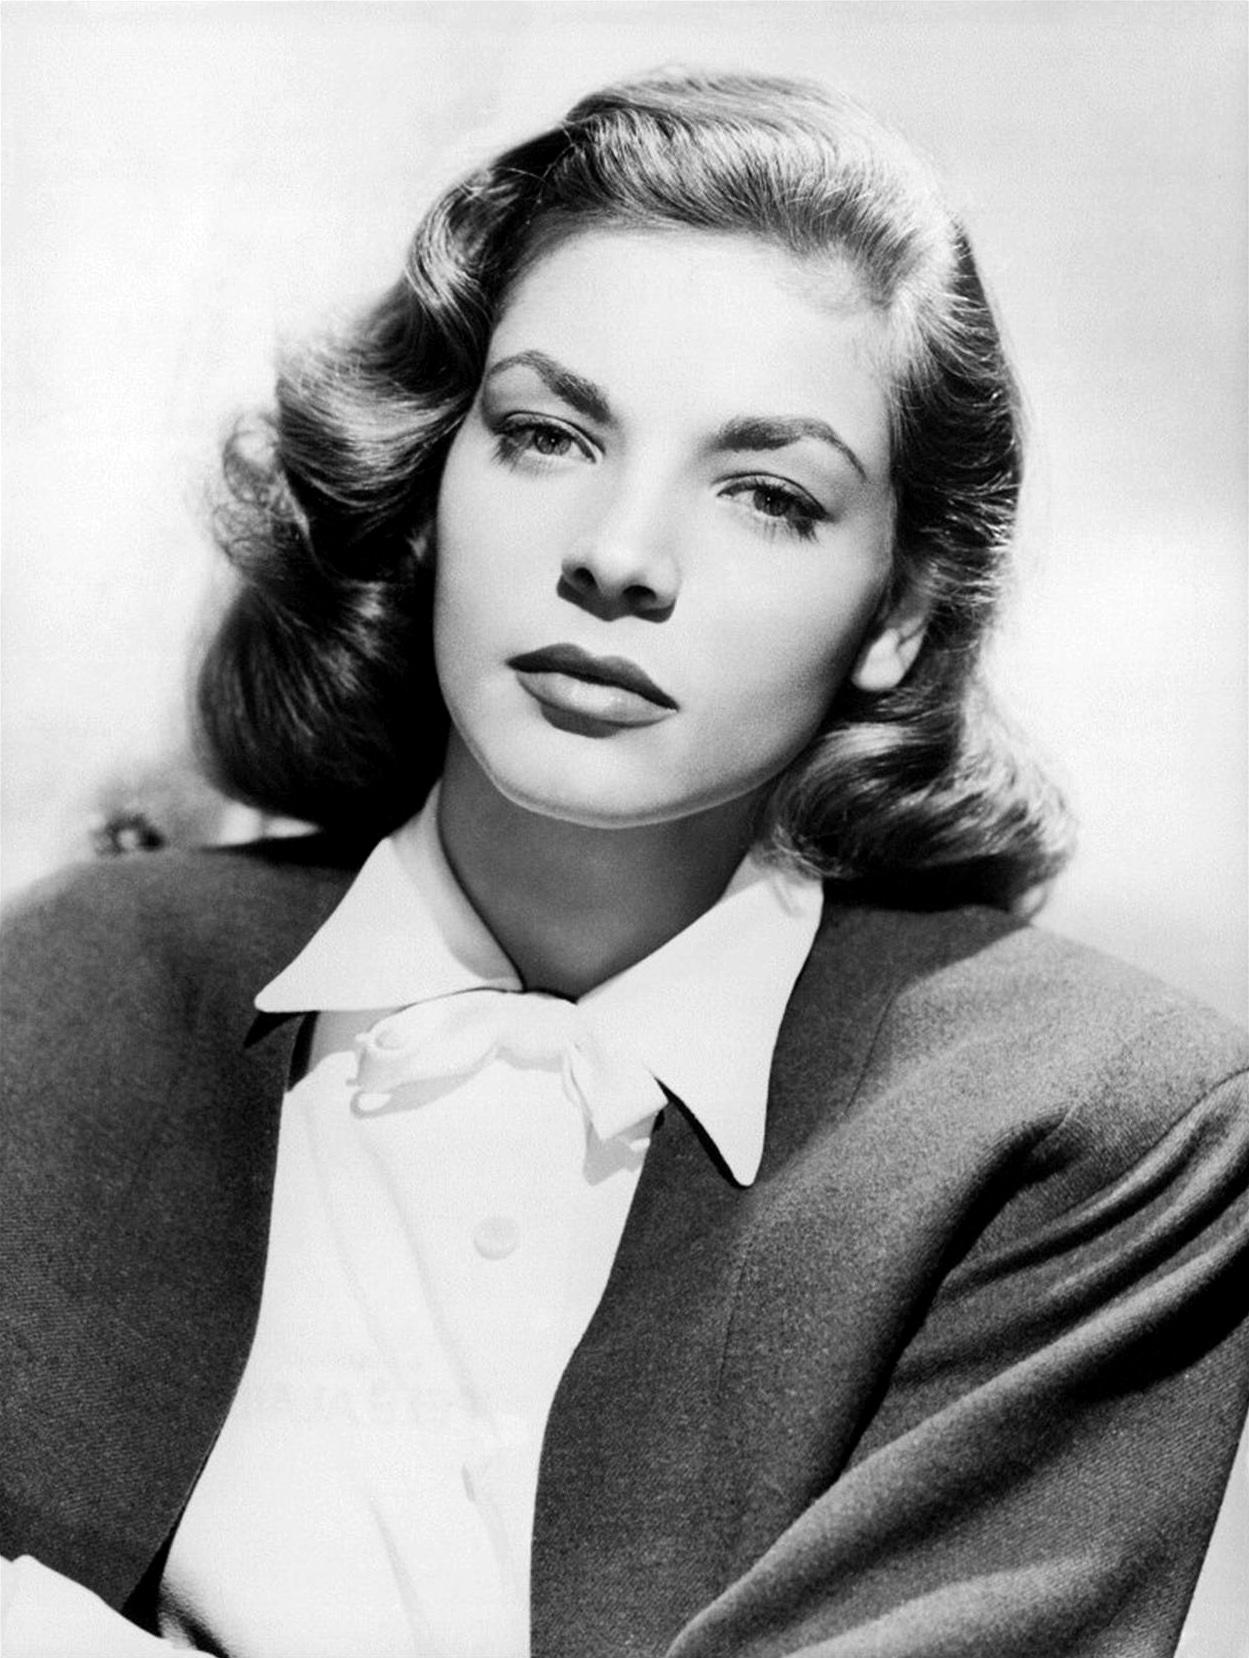 Lauren Bacall | Radio Star | Old Time Radio DownloadsLauren Bacall